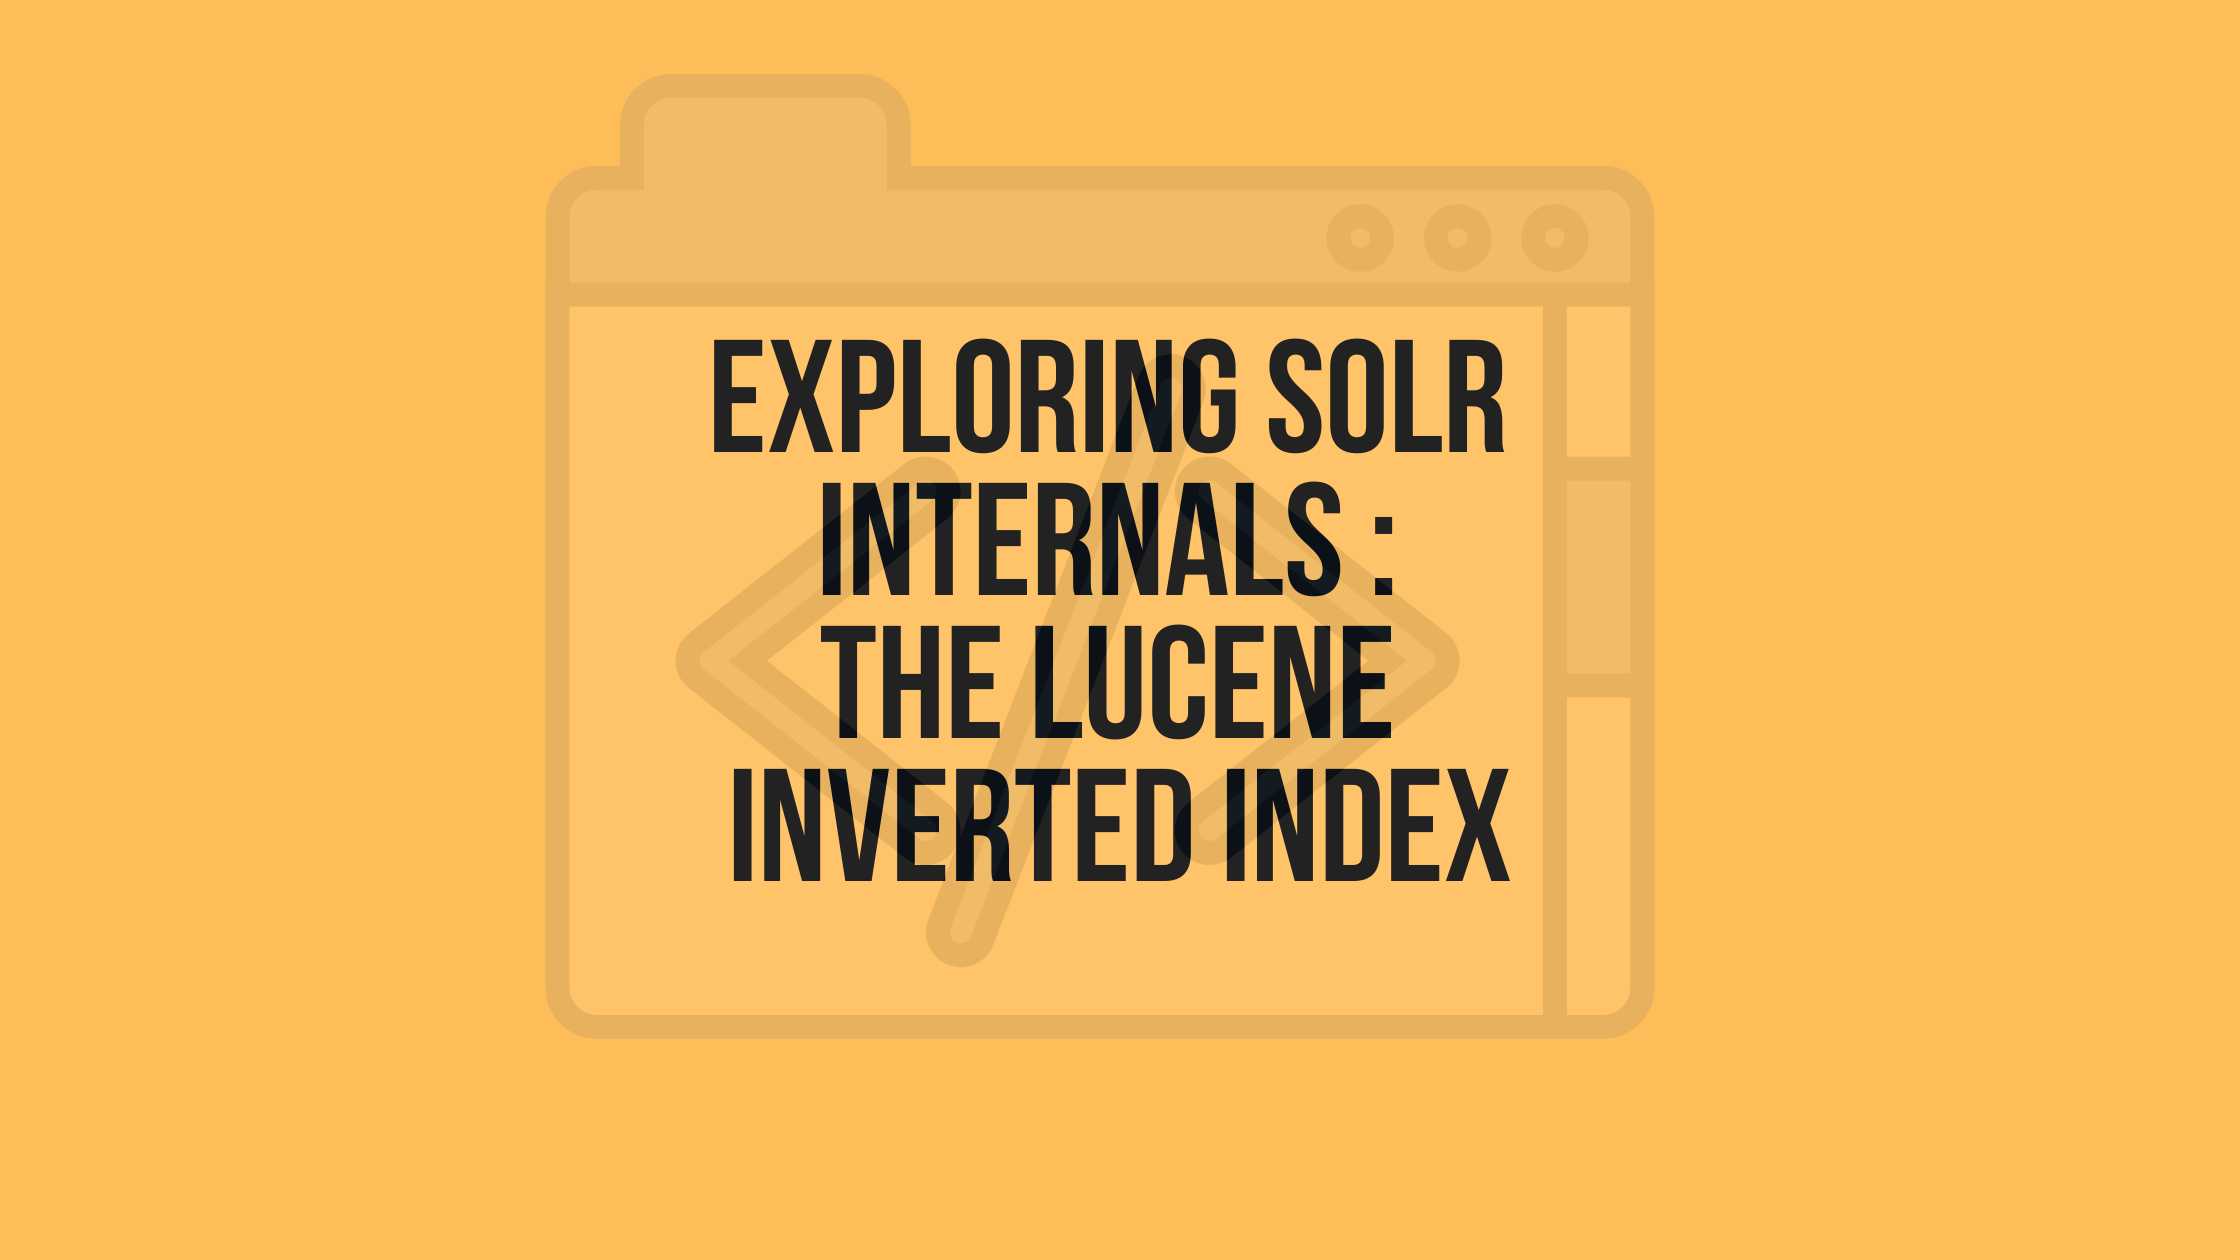 Exploring Solr Internals : The Lucene Inverted Index